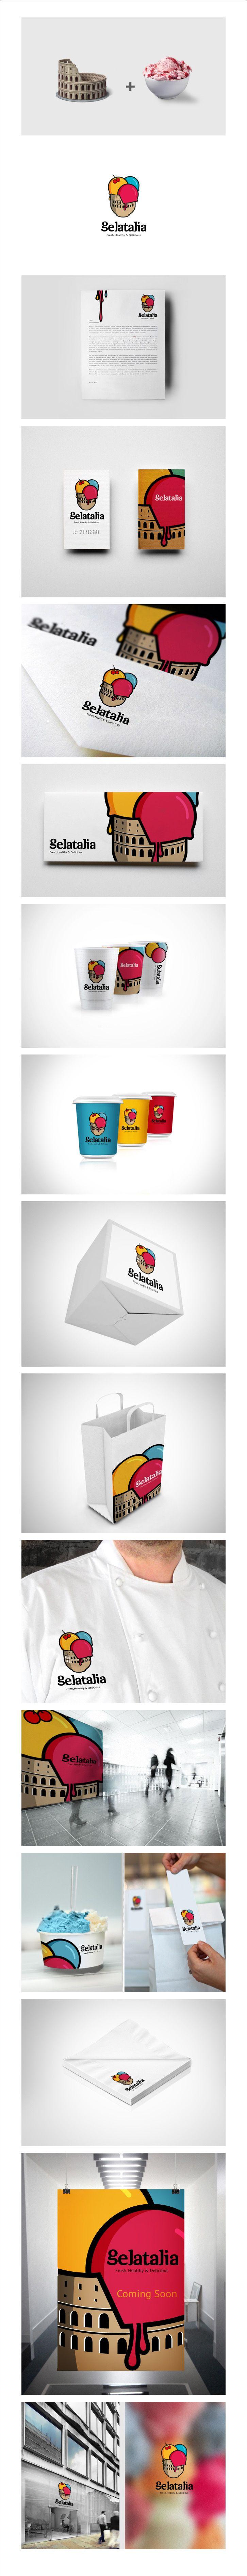 gelatalia - ice cream | #logo #stationary #corporate #design #corporatedesign #identity #branding #behance